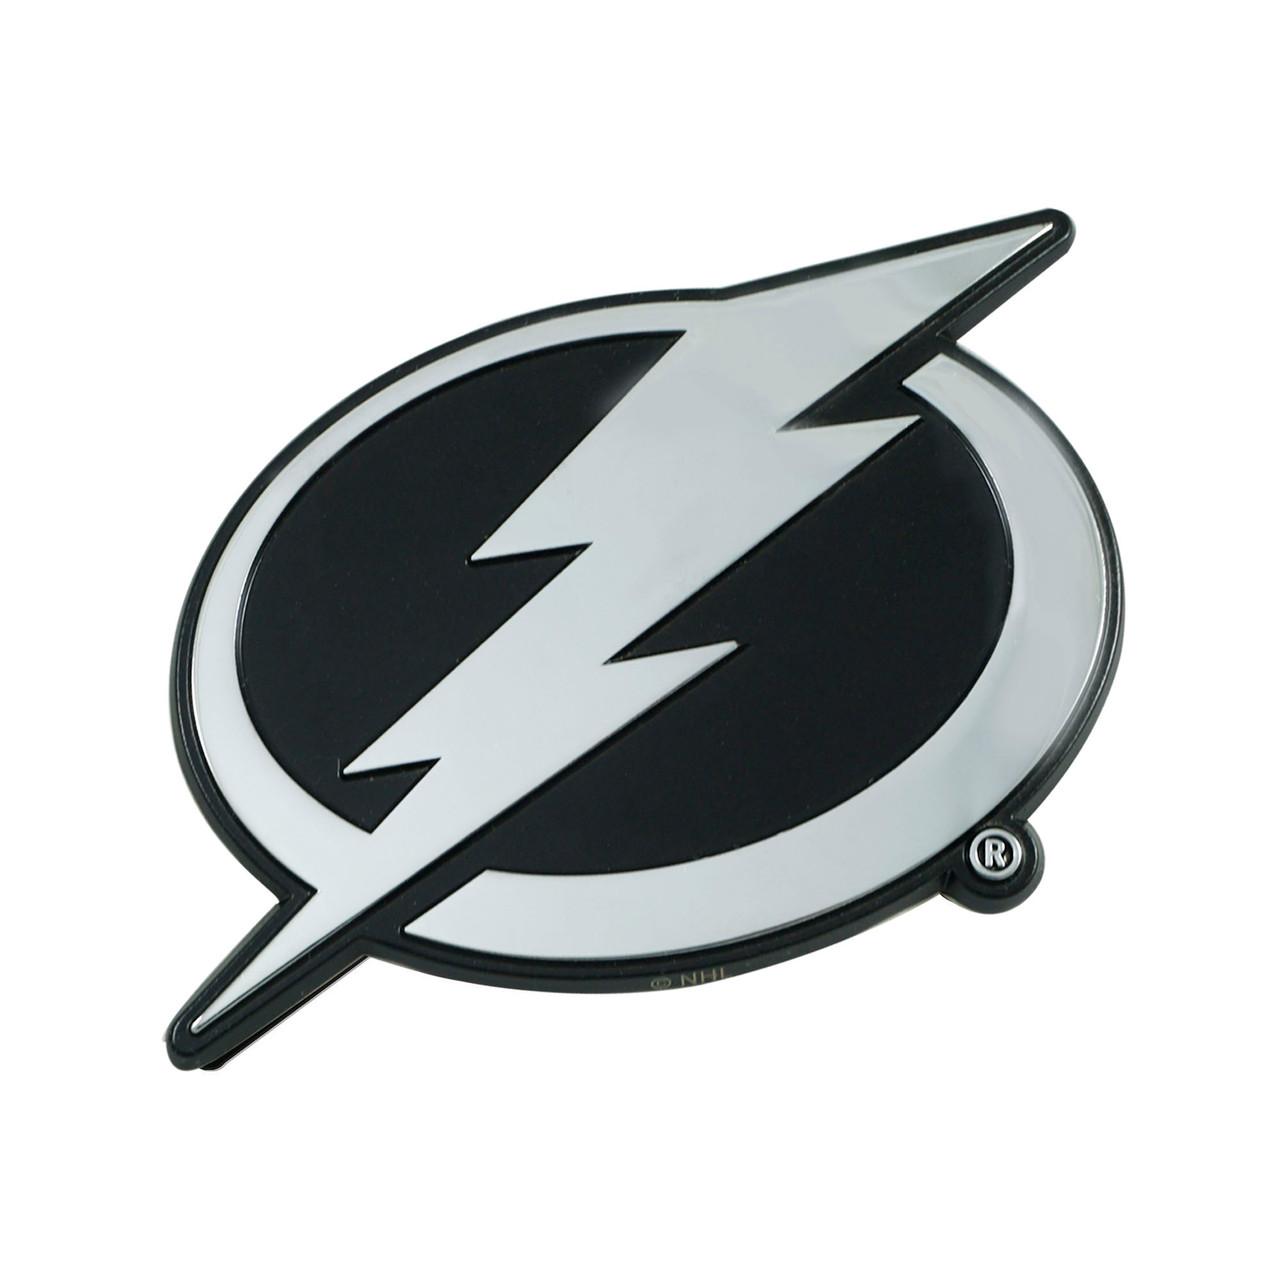 Tampa Bay Lightning Auto Emblem Premium Metal Chrome Special Order